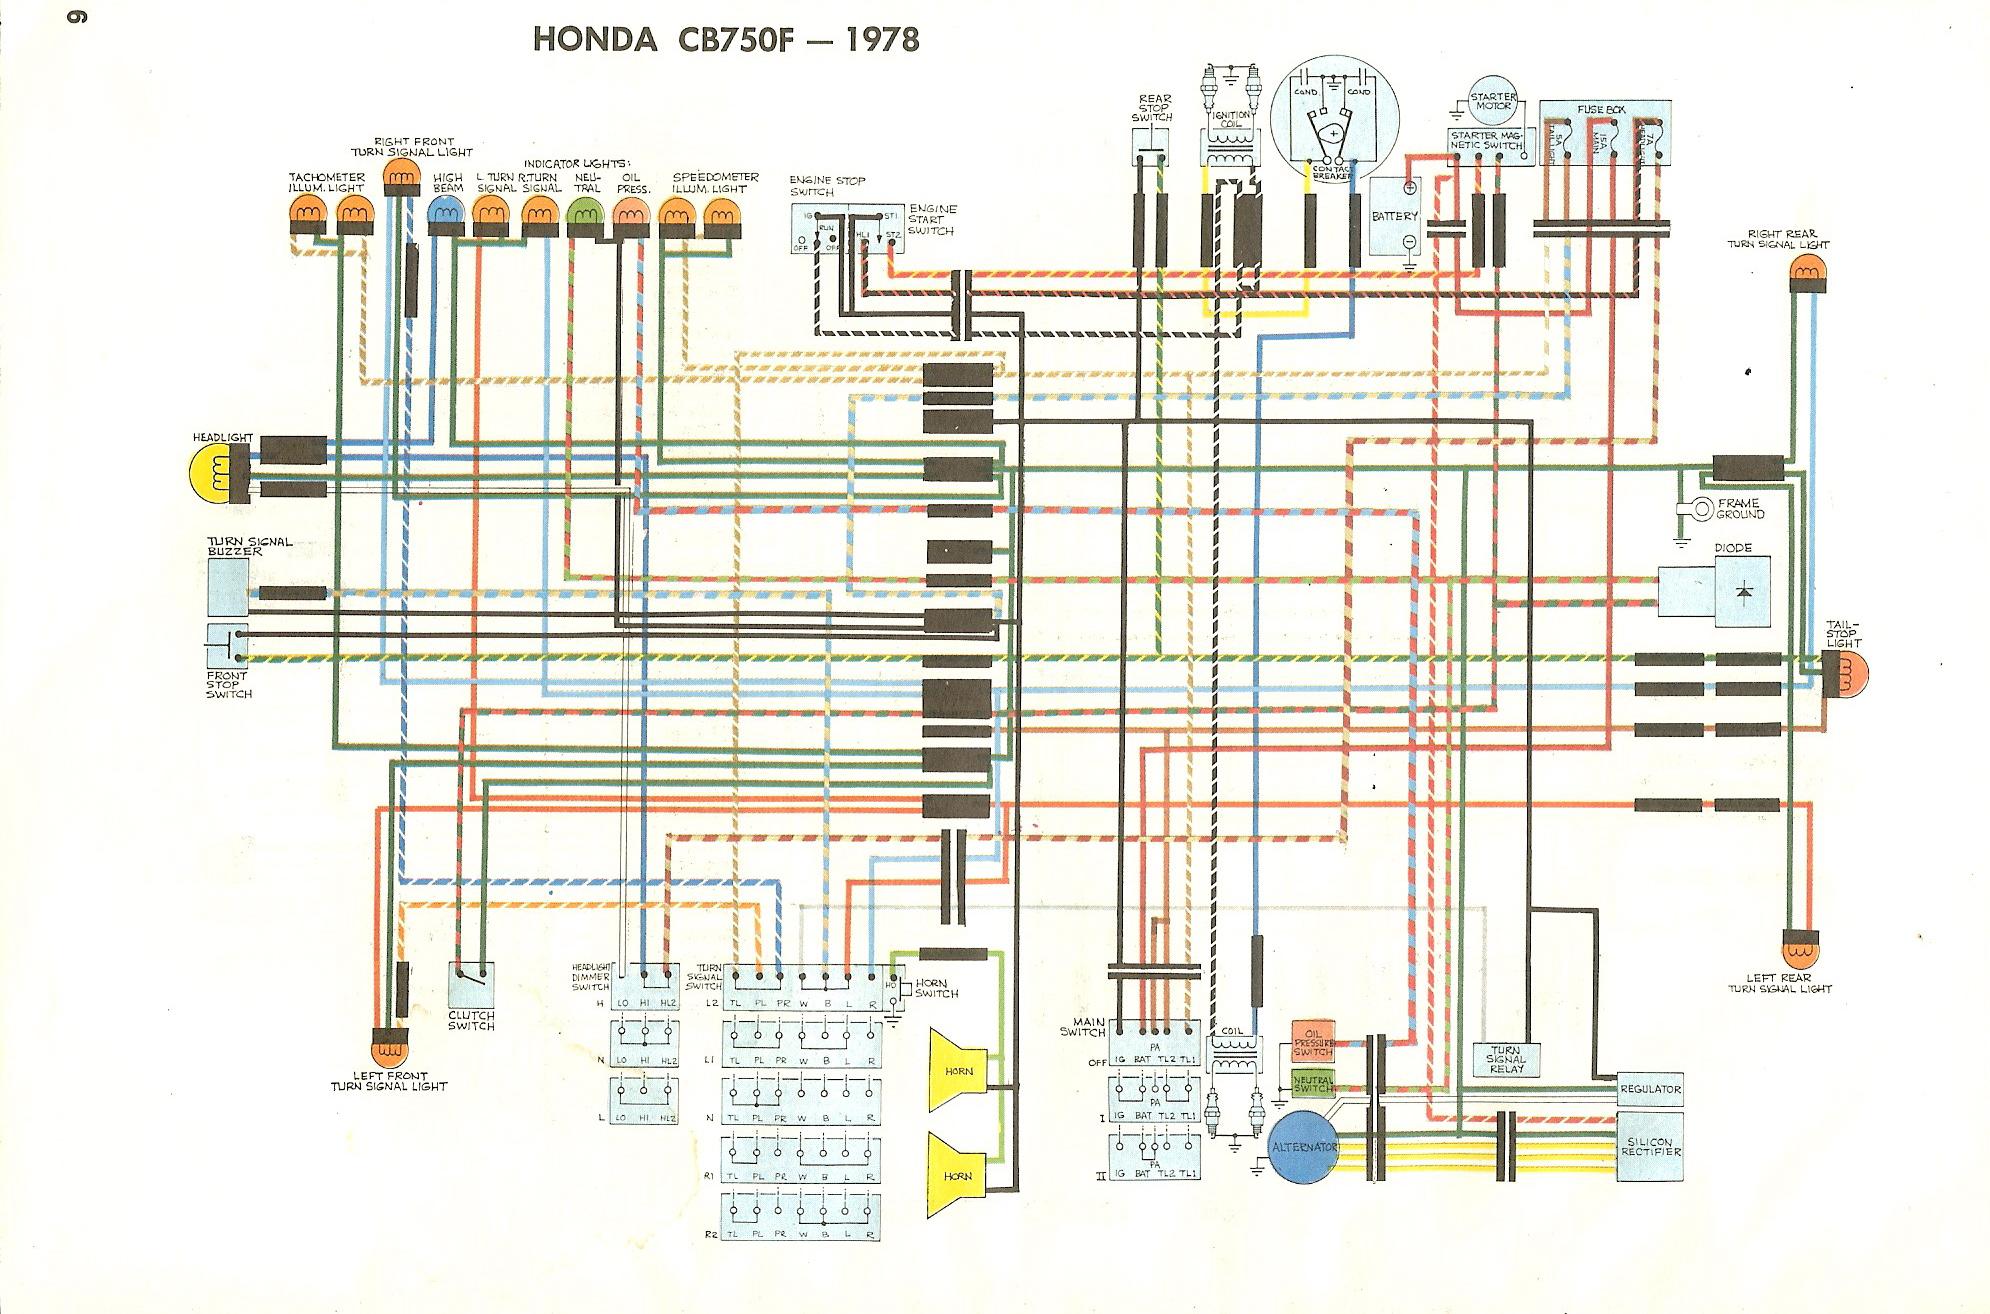 1978 Honda Cb550 Wiring Diagram - Best Of Wiring Diagram Datasheet